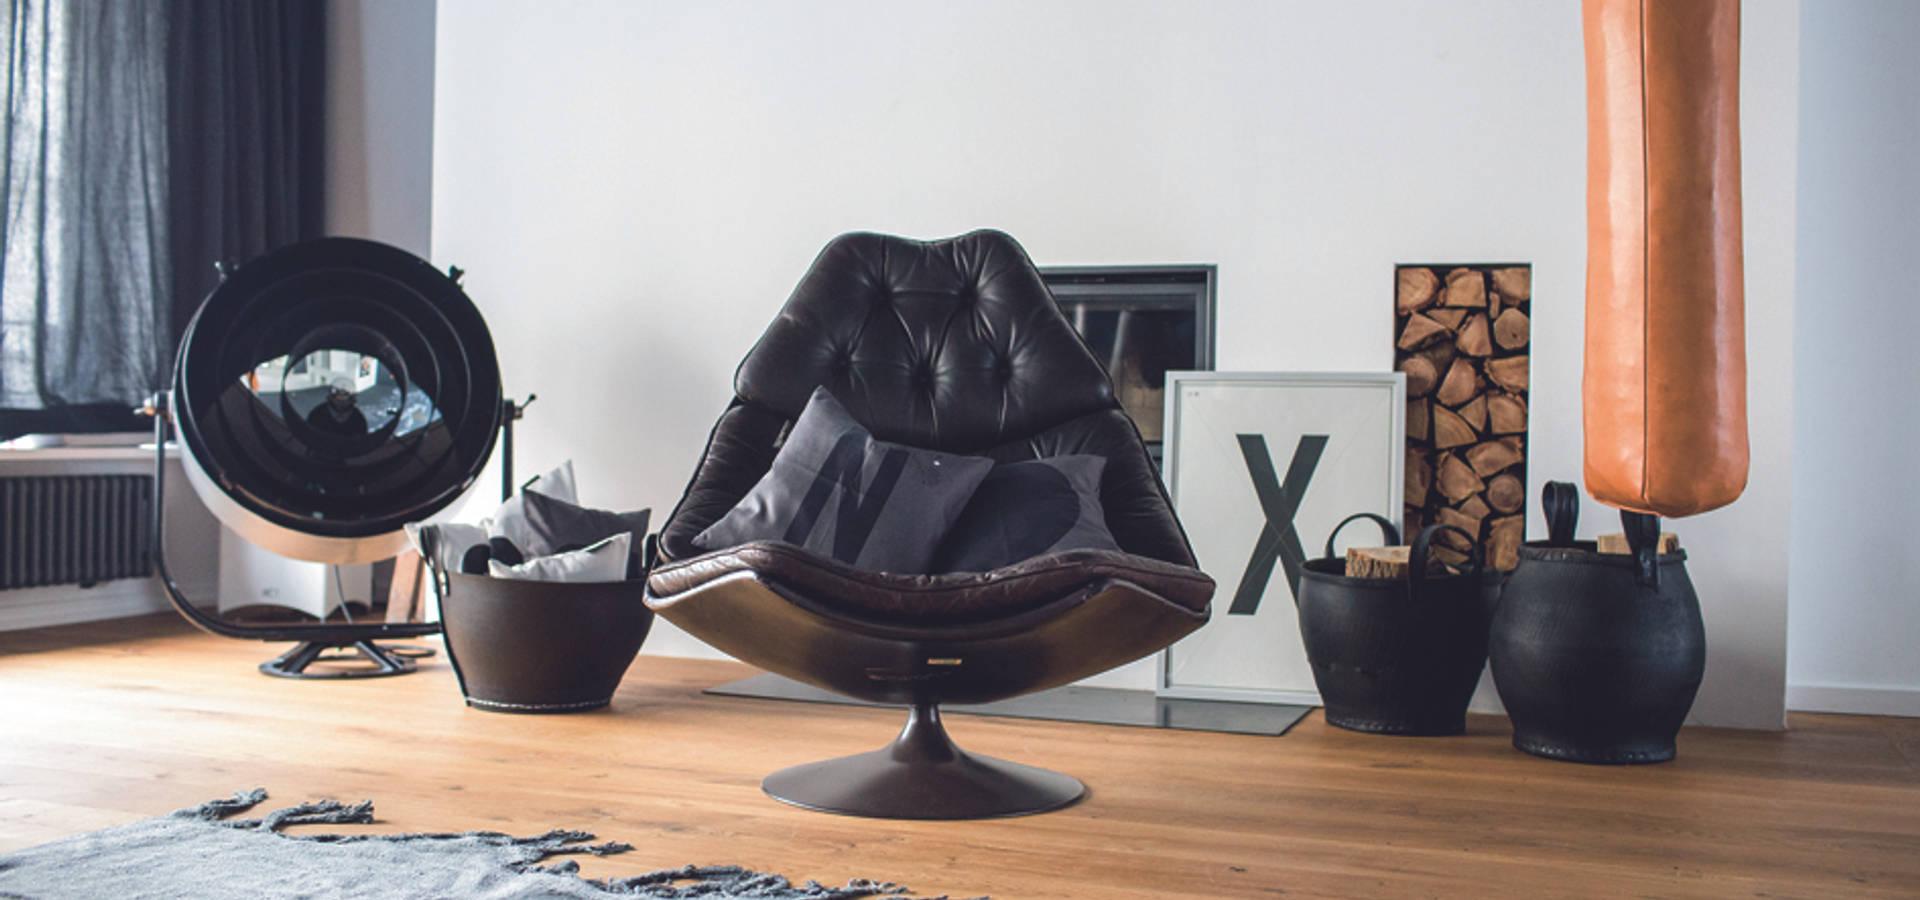 din berlin von type hype homify. Black Bedroom Furniture Sets. Home Design Ideas